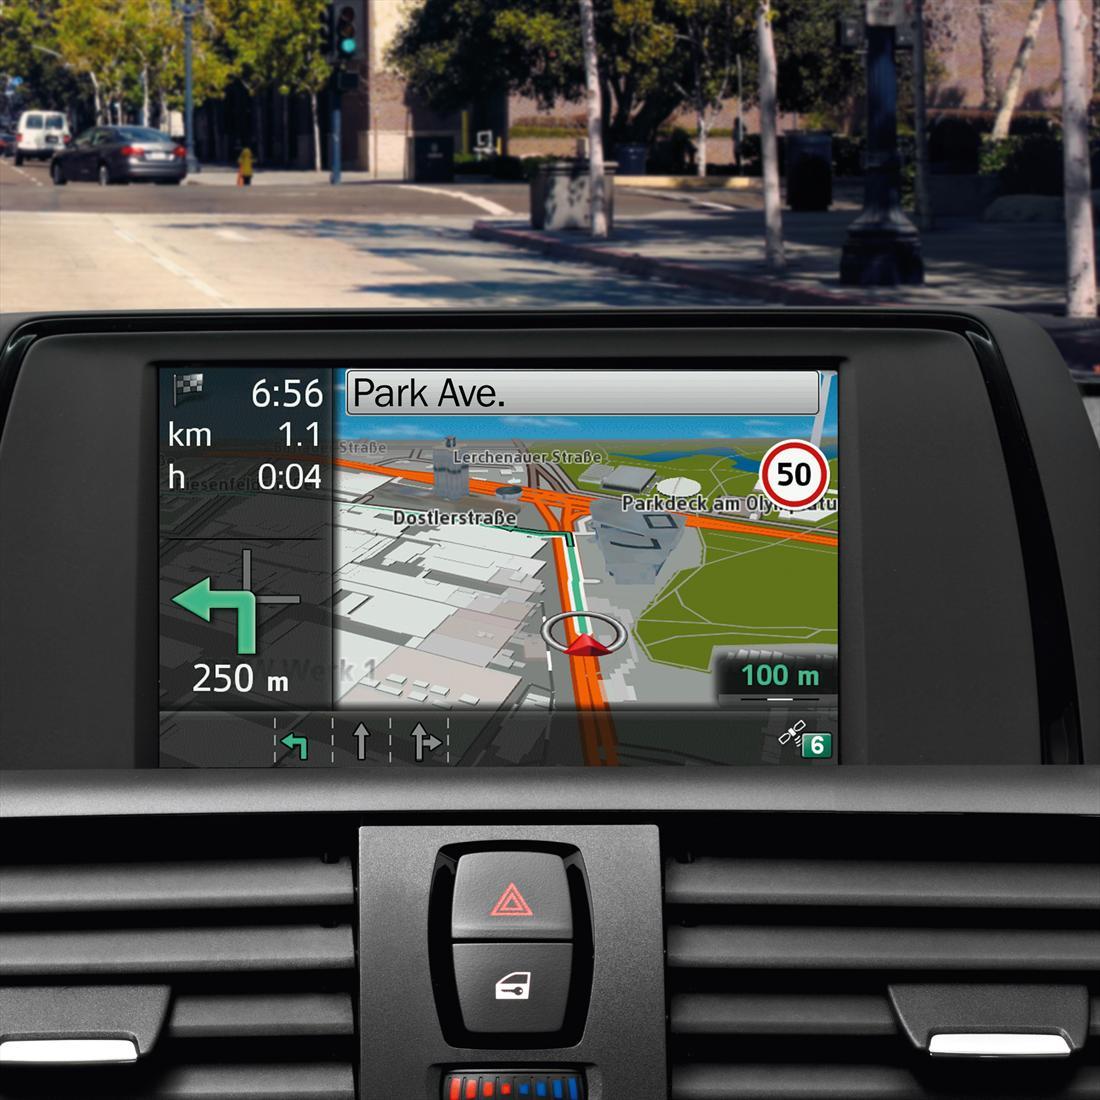 1997 Dodge Radio Wiring Diagram Shopbmwusa Com Bmw Integrated Navigation Retrofit